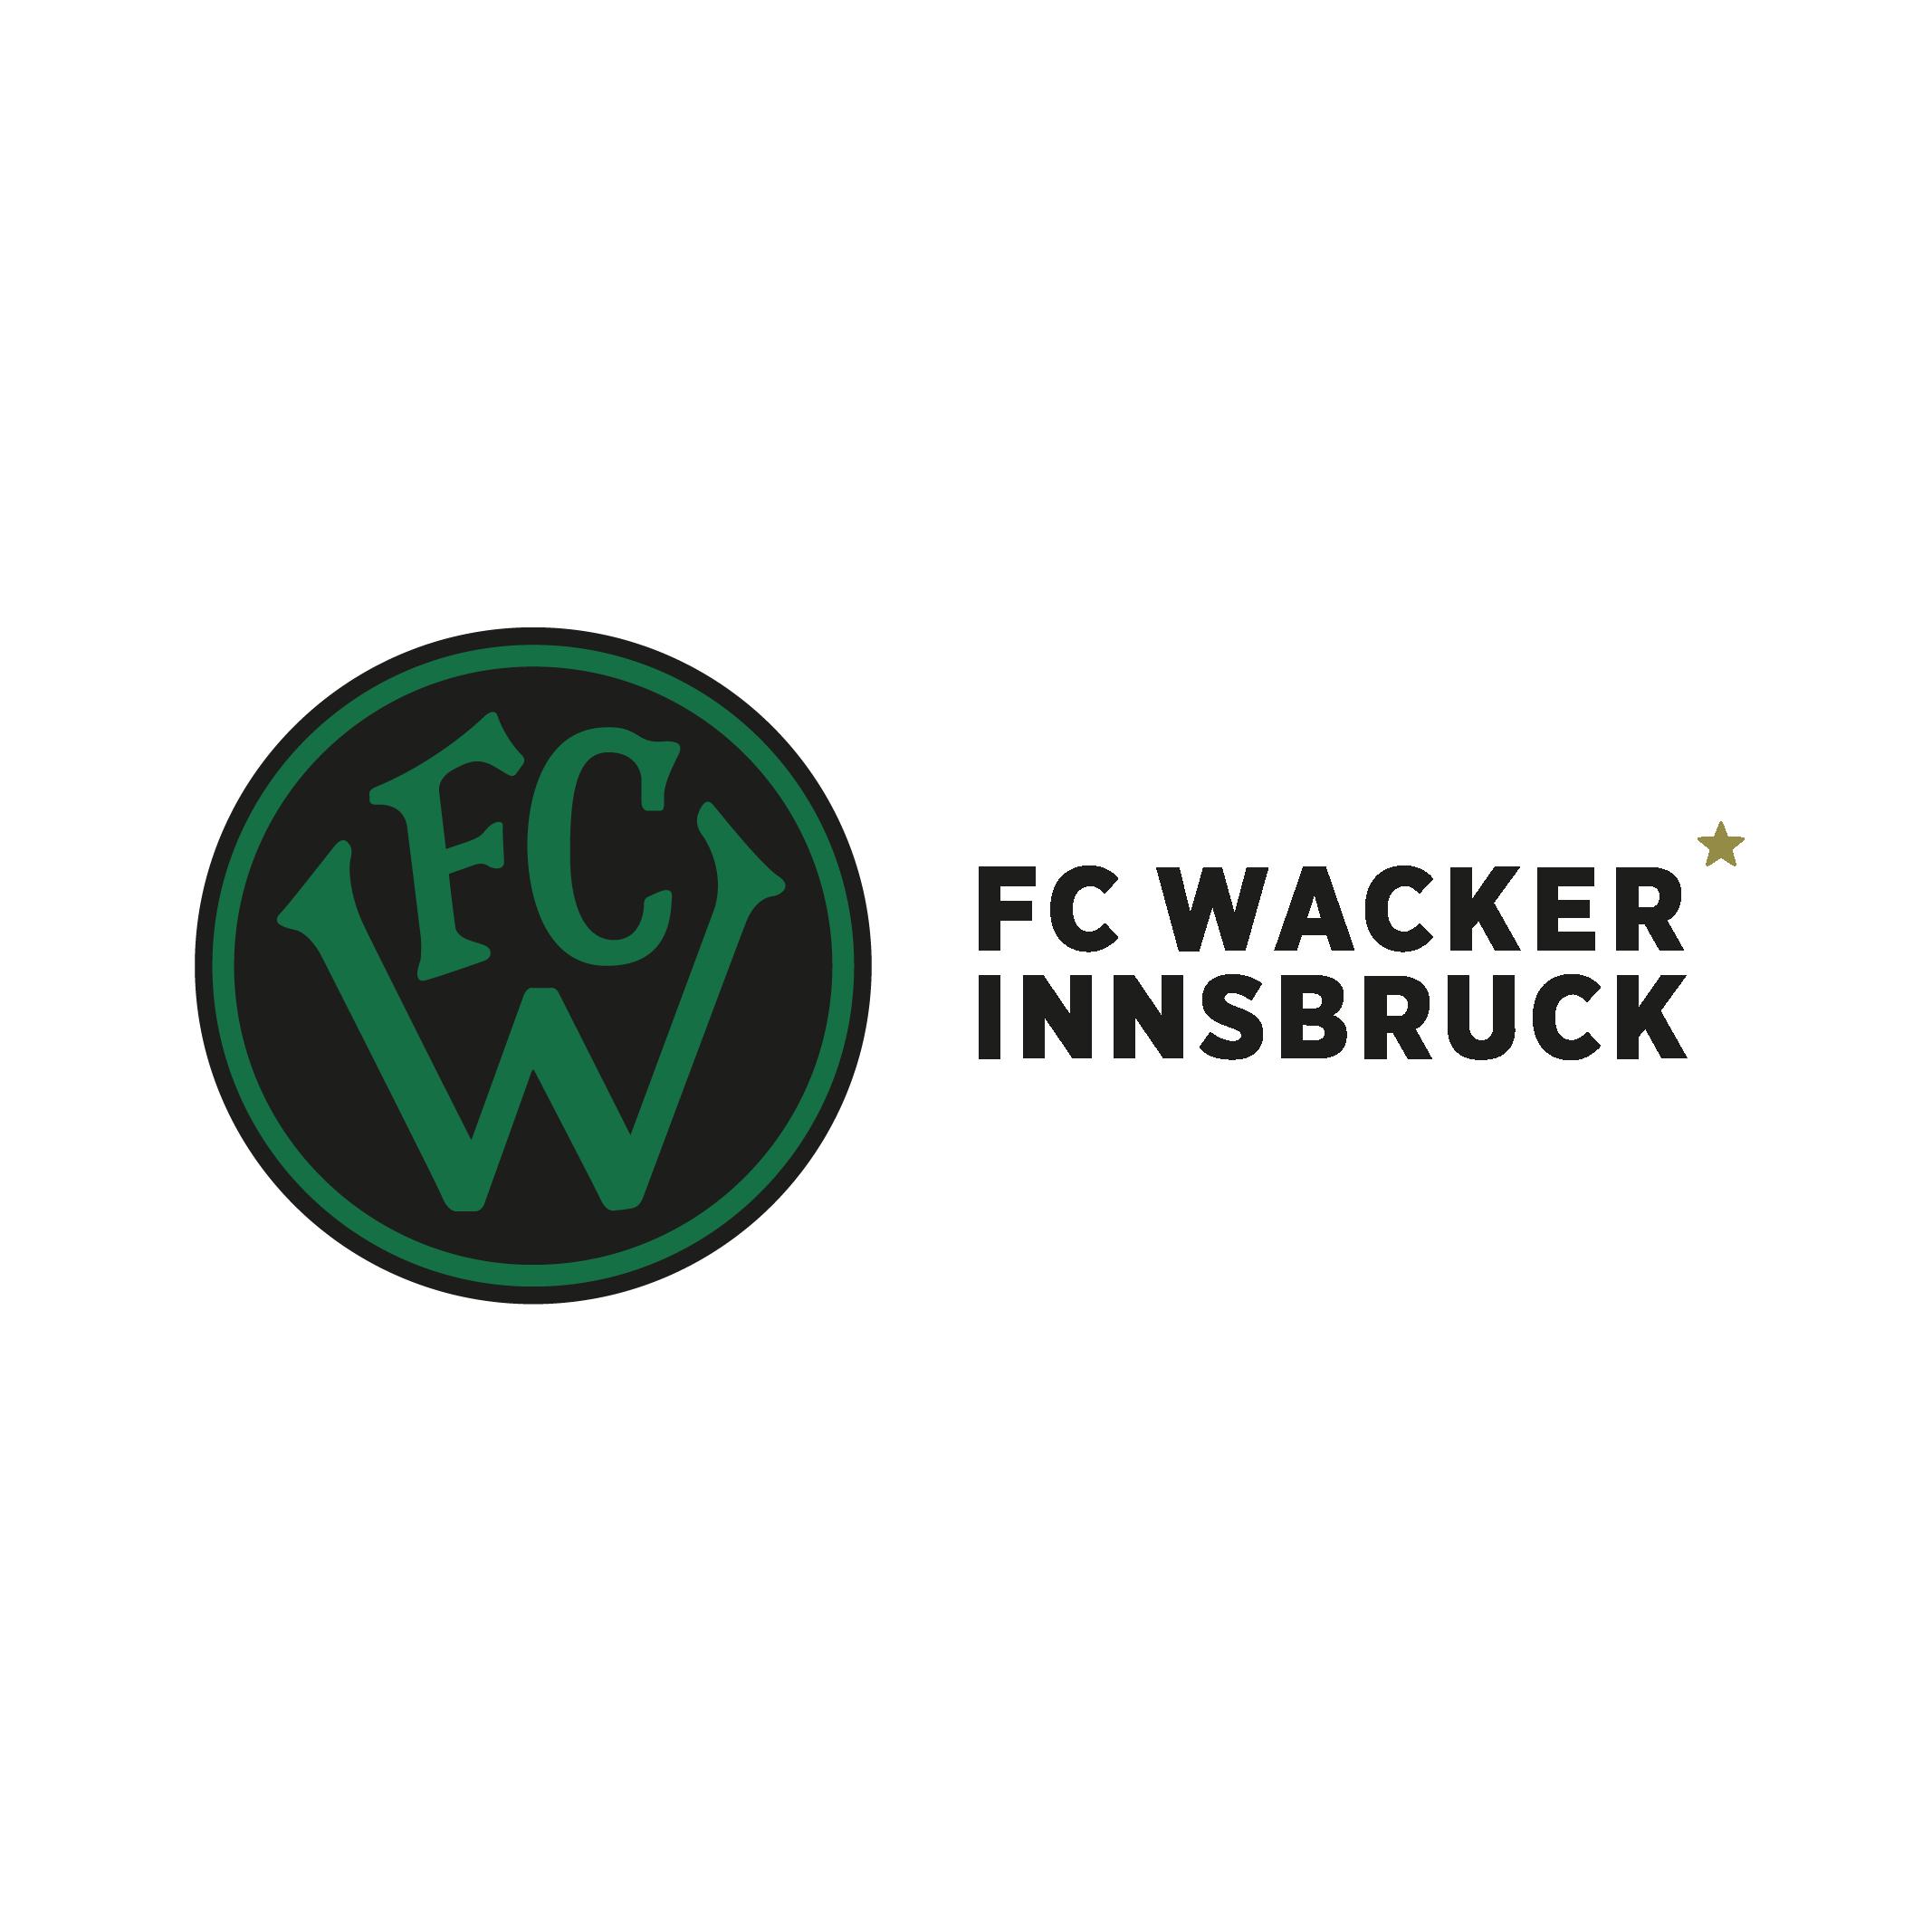 https://www.influxmediahouse.com/wp-content/uploads/2020/01/Logo_FCW-colour.png